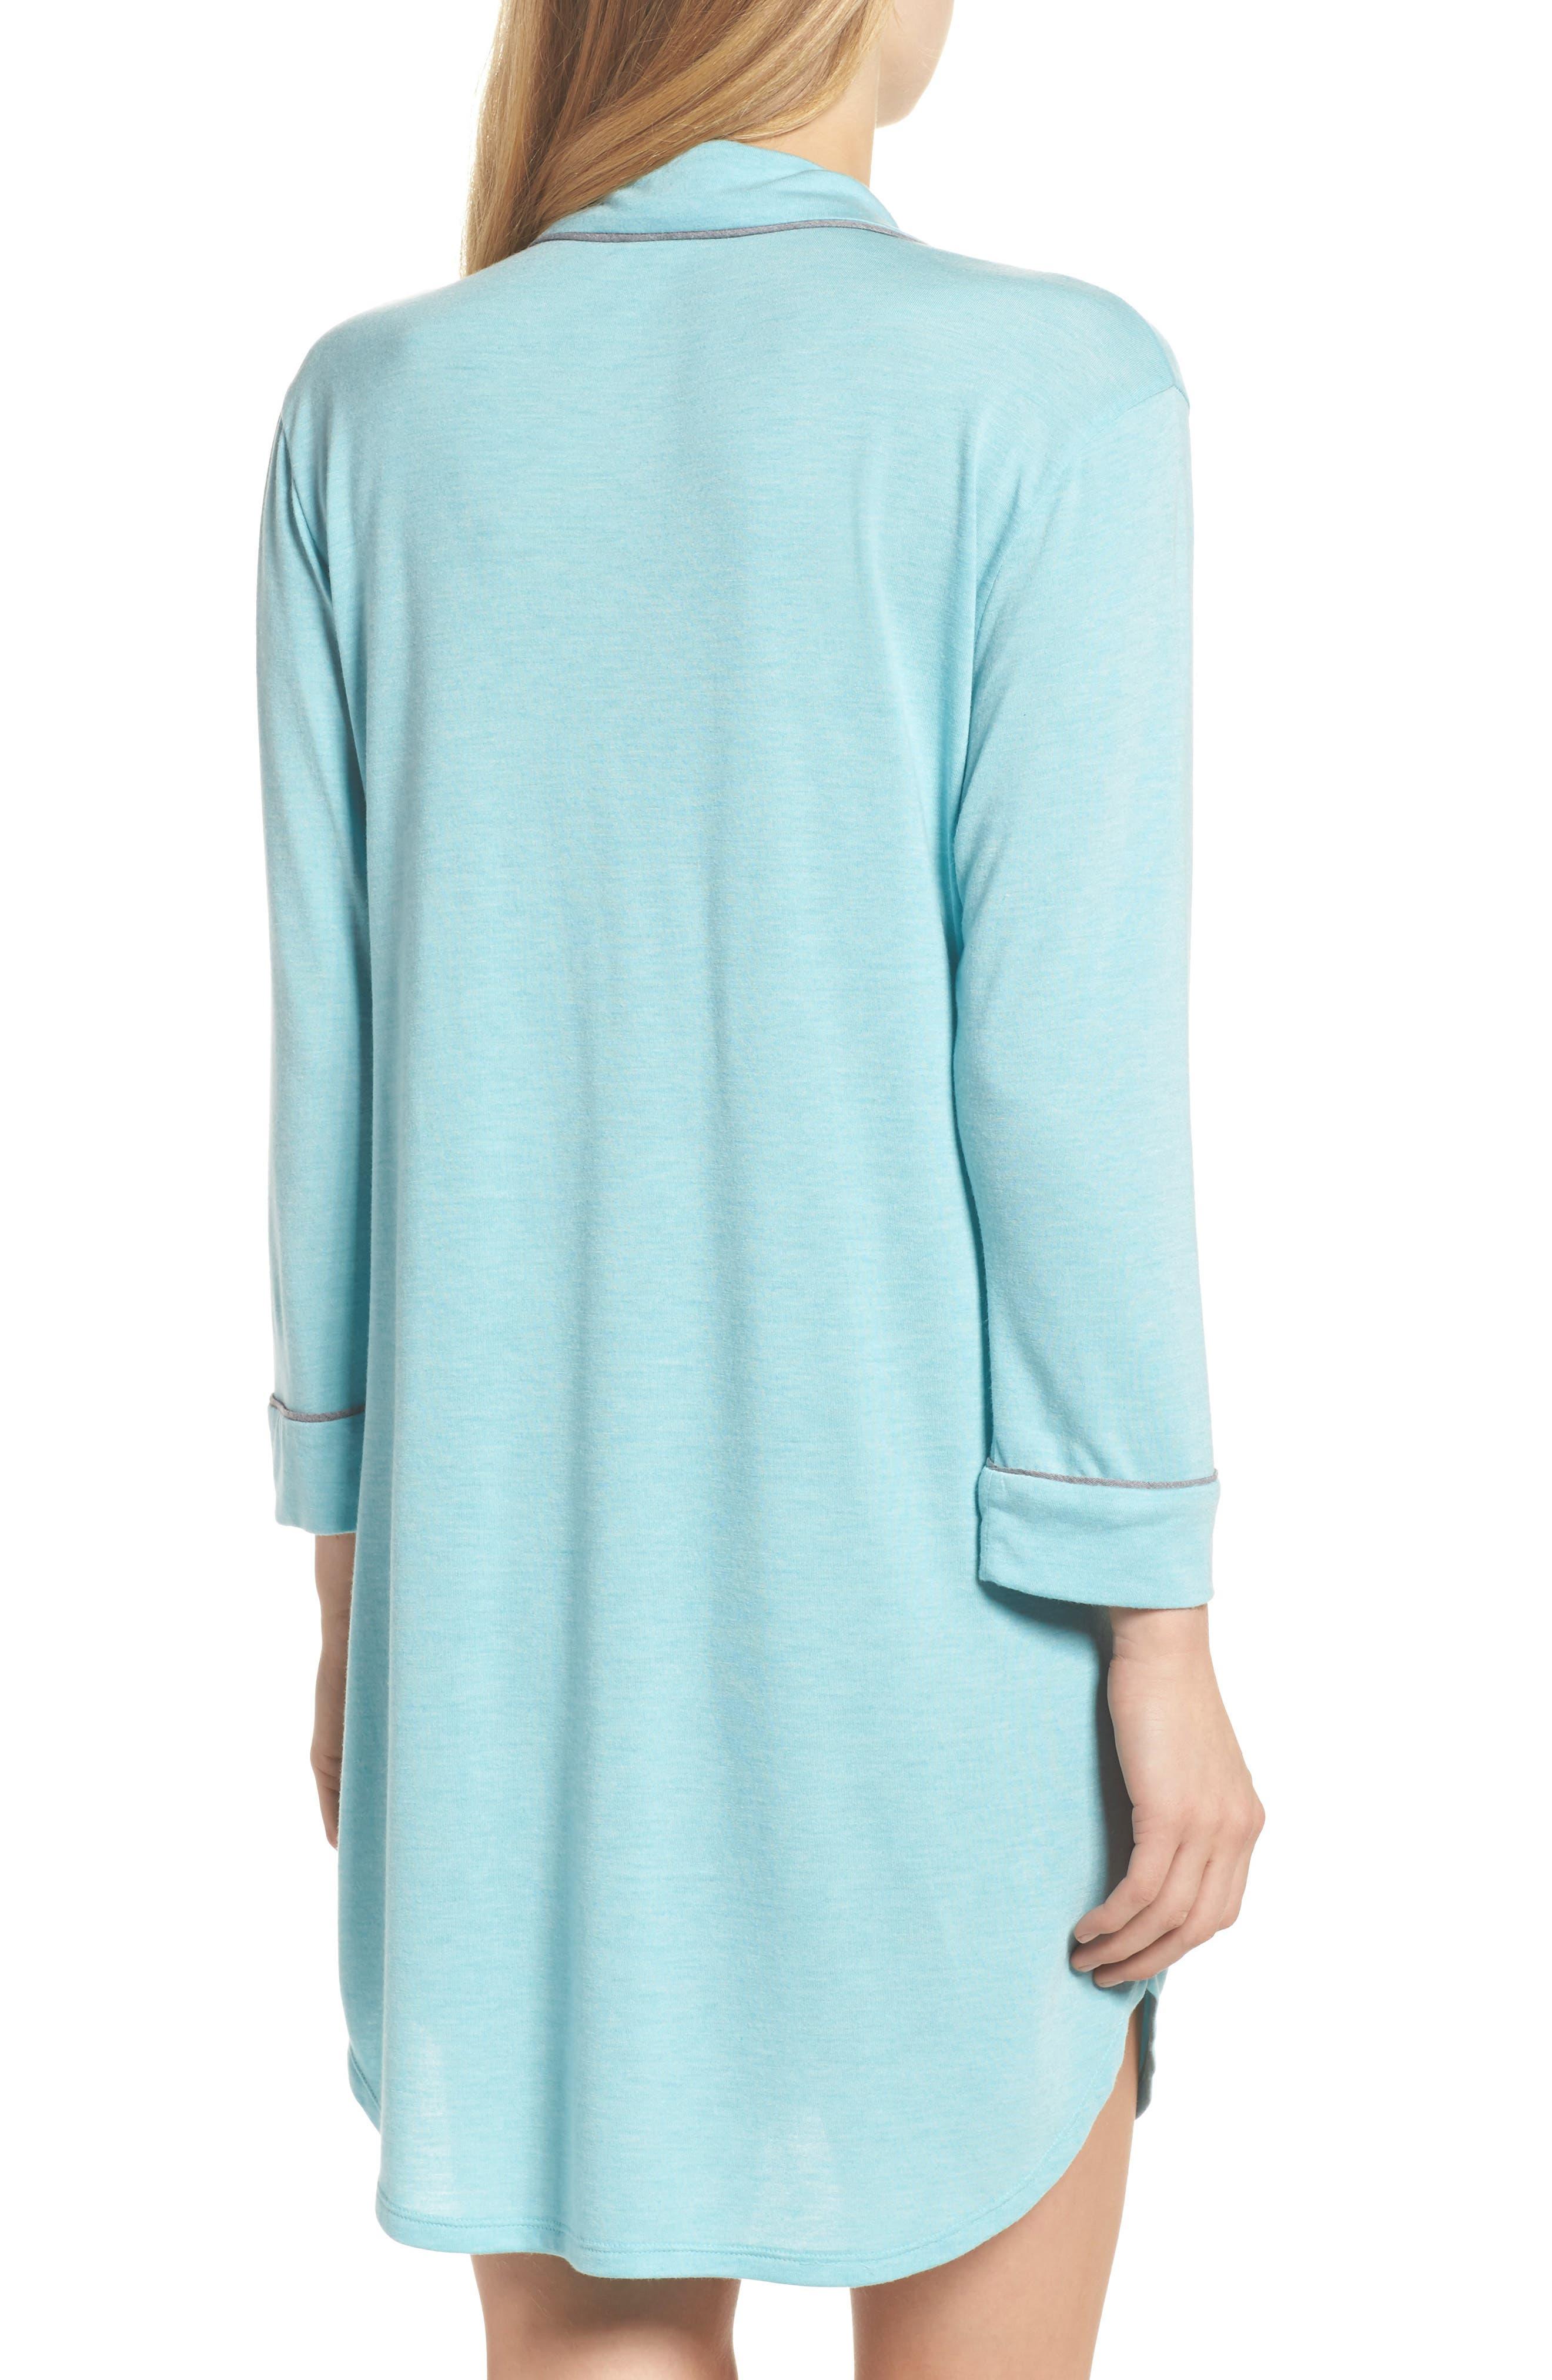 Shangri-La Sleep Shirt,                             Alternate thumbnail 2, color,                             Turquoise